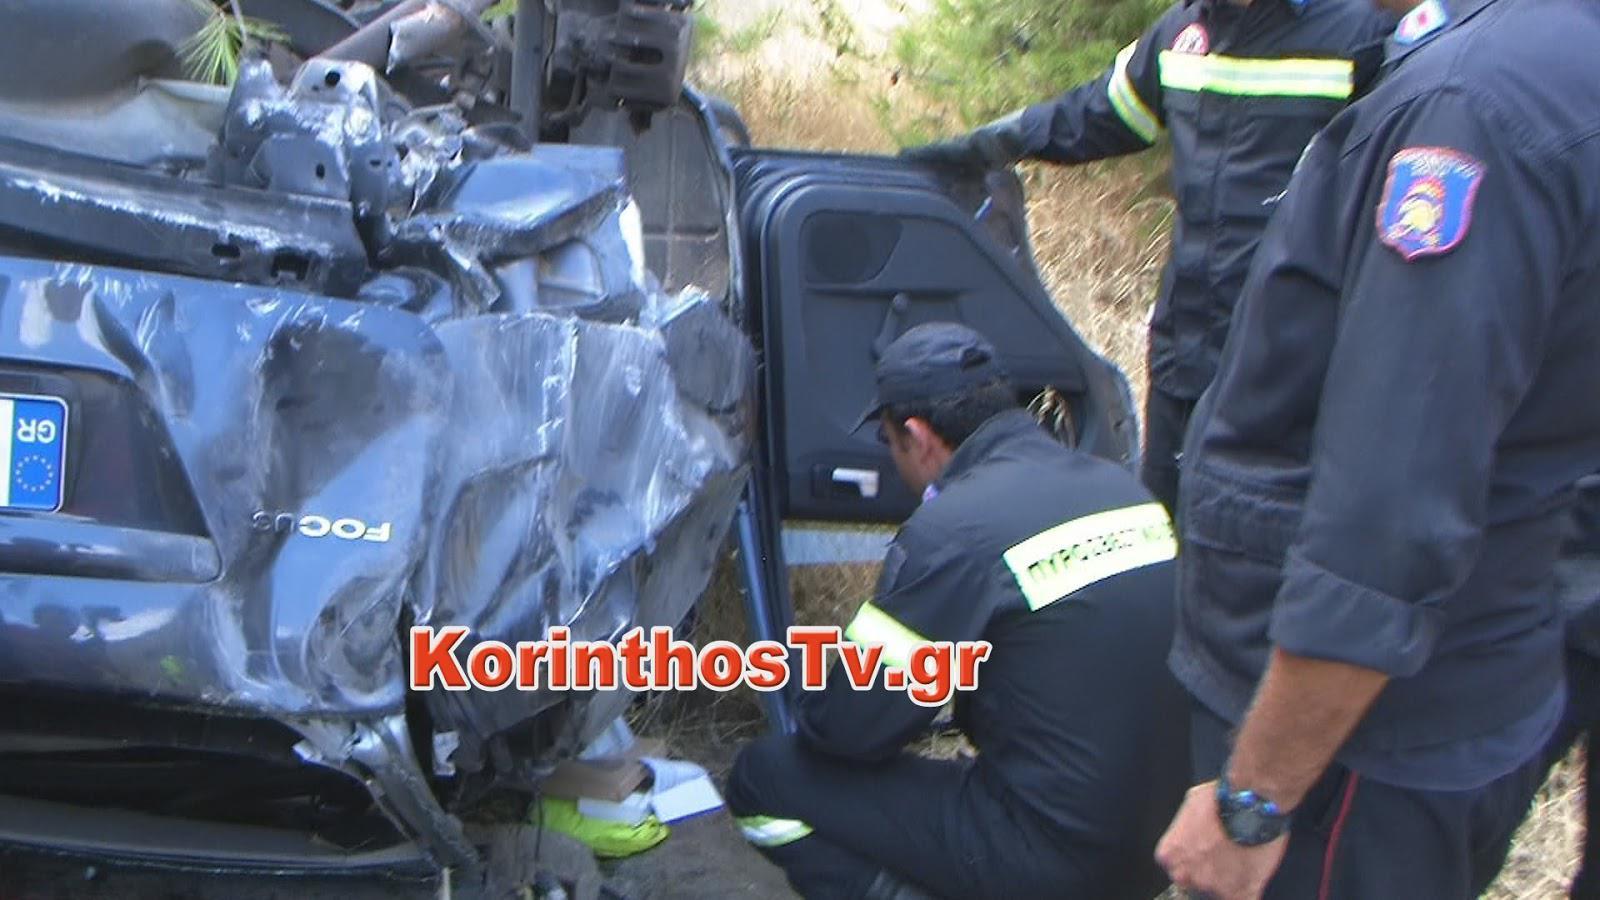 korinthos6_1 Γλίτωσαν από θαύμα καθώς το αυτοκίνητο τους έπεσε σε γκρεμό [εικόνες]